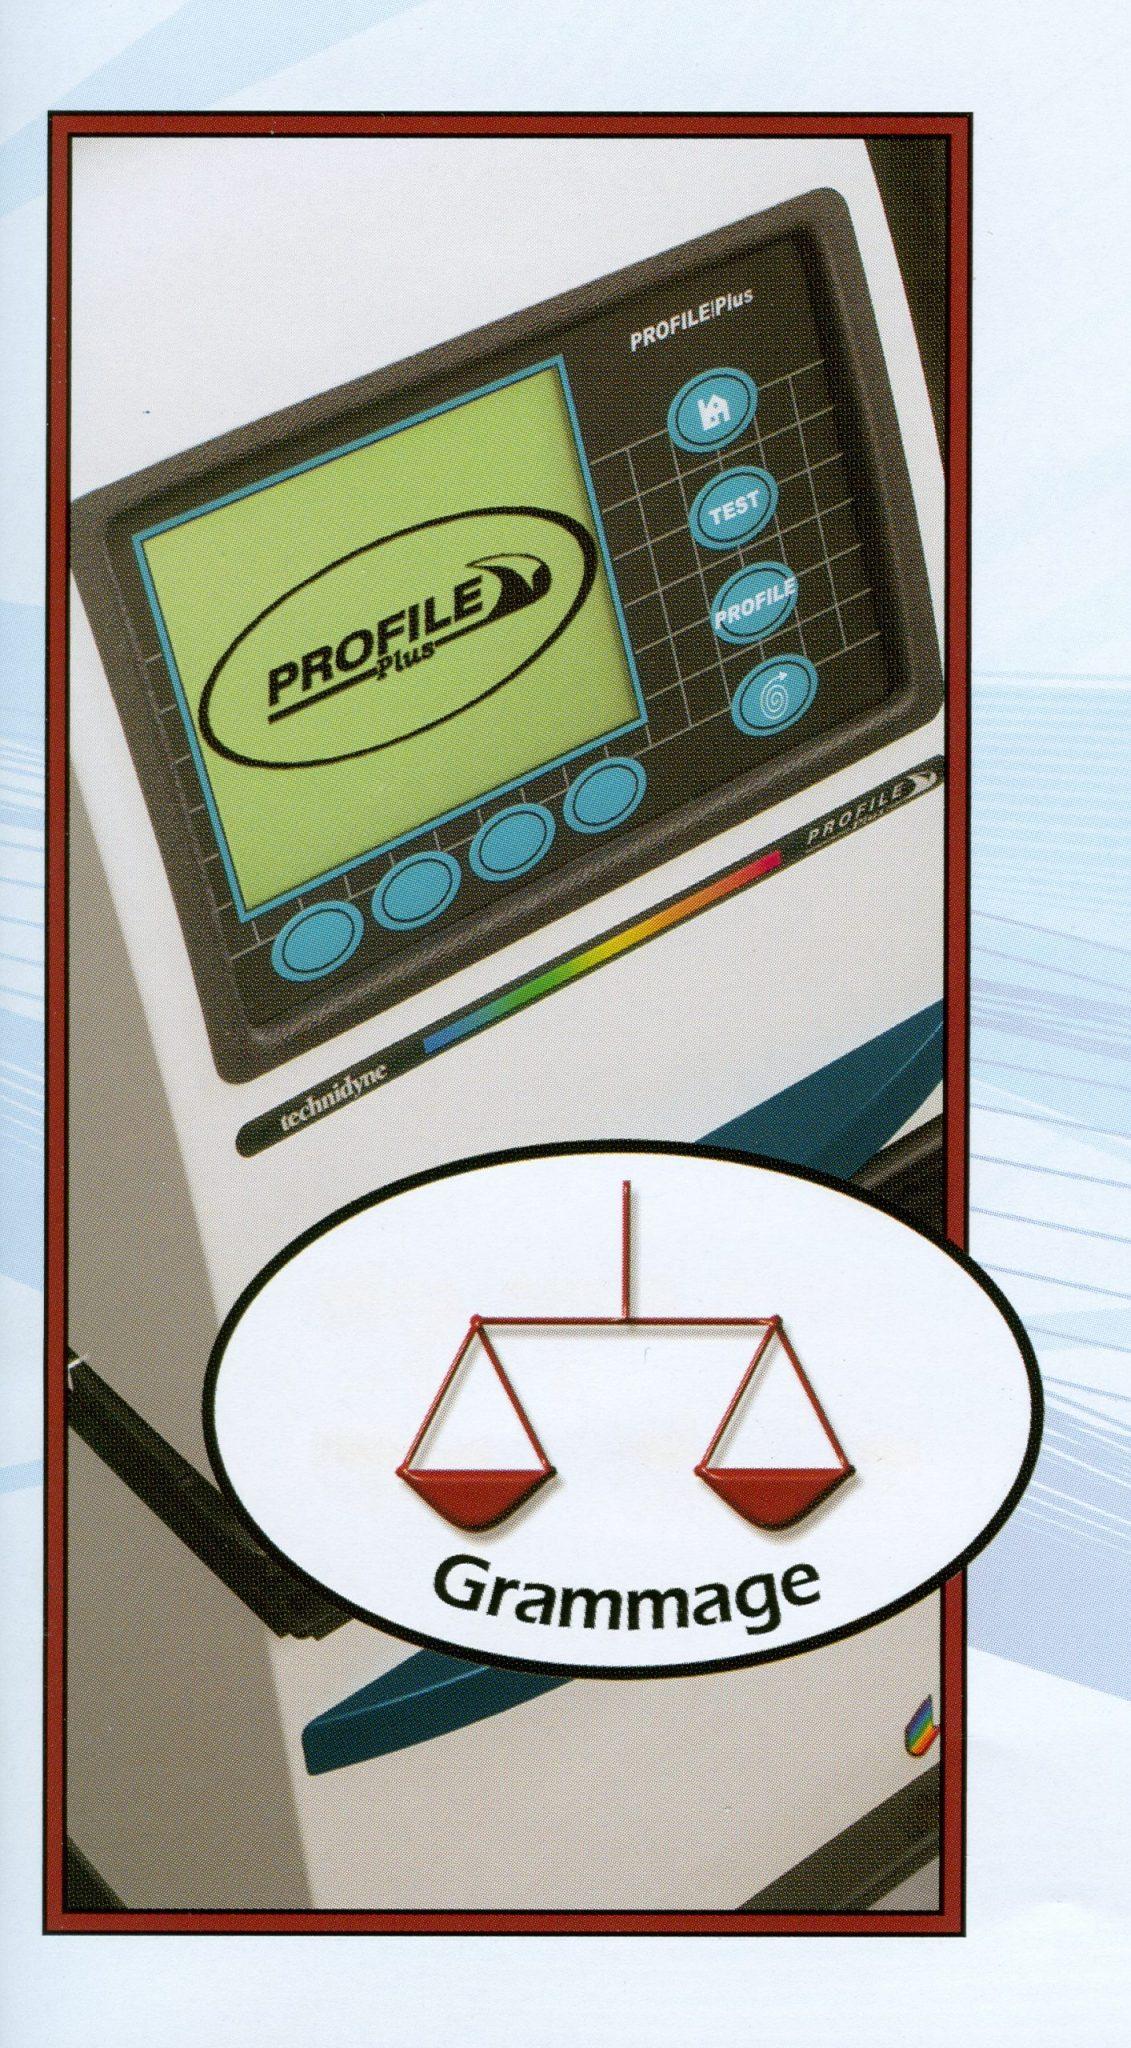 PROFILE Plus Grammage – Technidyne